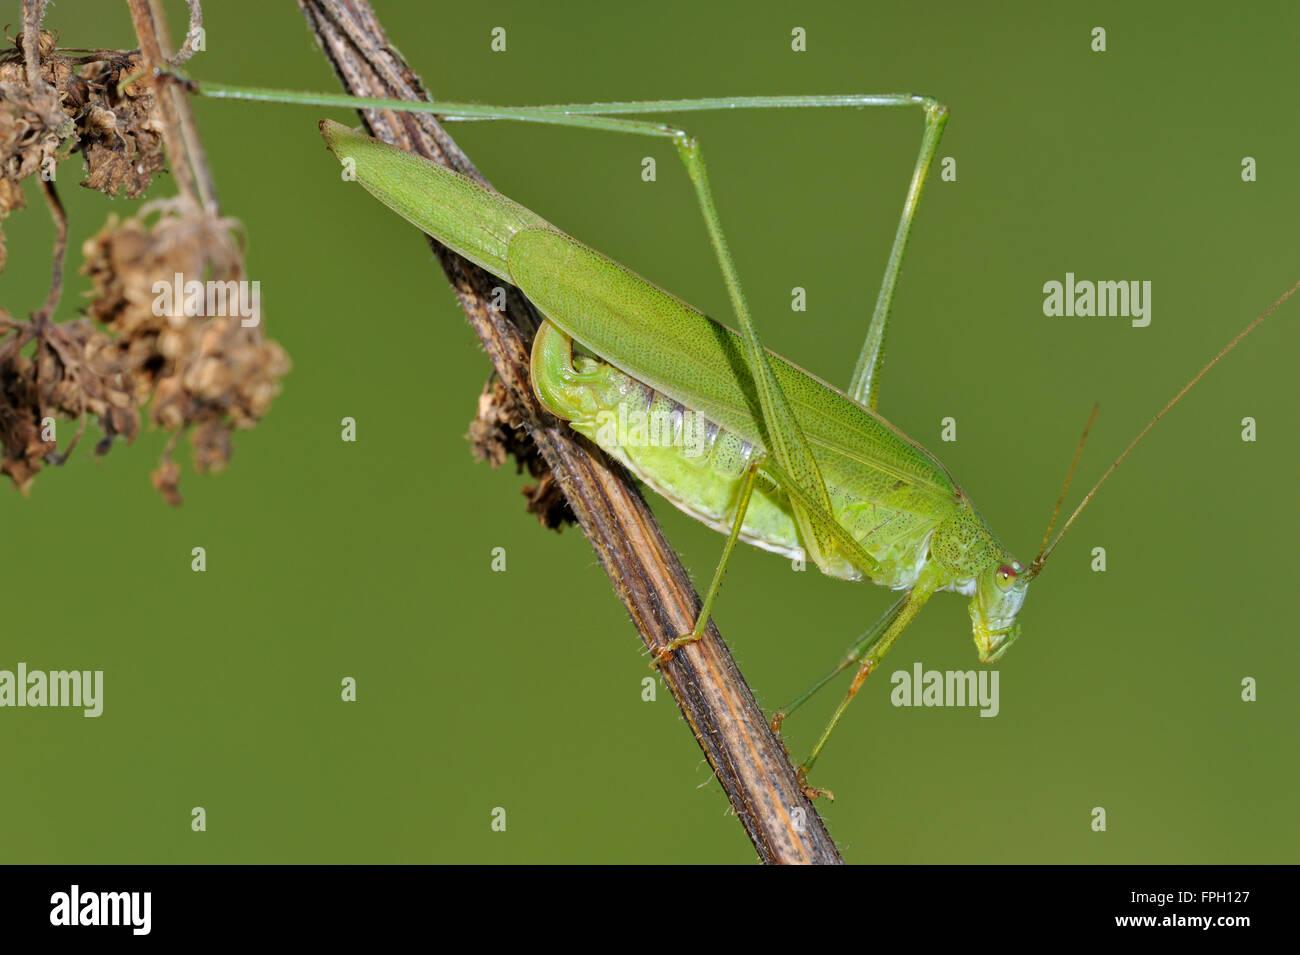 Sickle-bearing bush-cricket (Phaneroptera falcata) female on stem in grassland - Stock Image